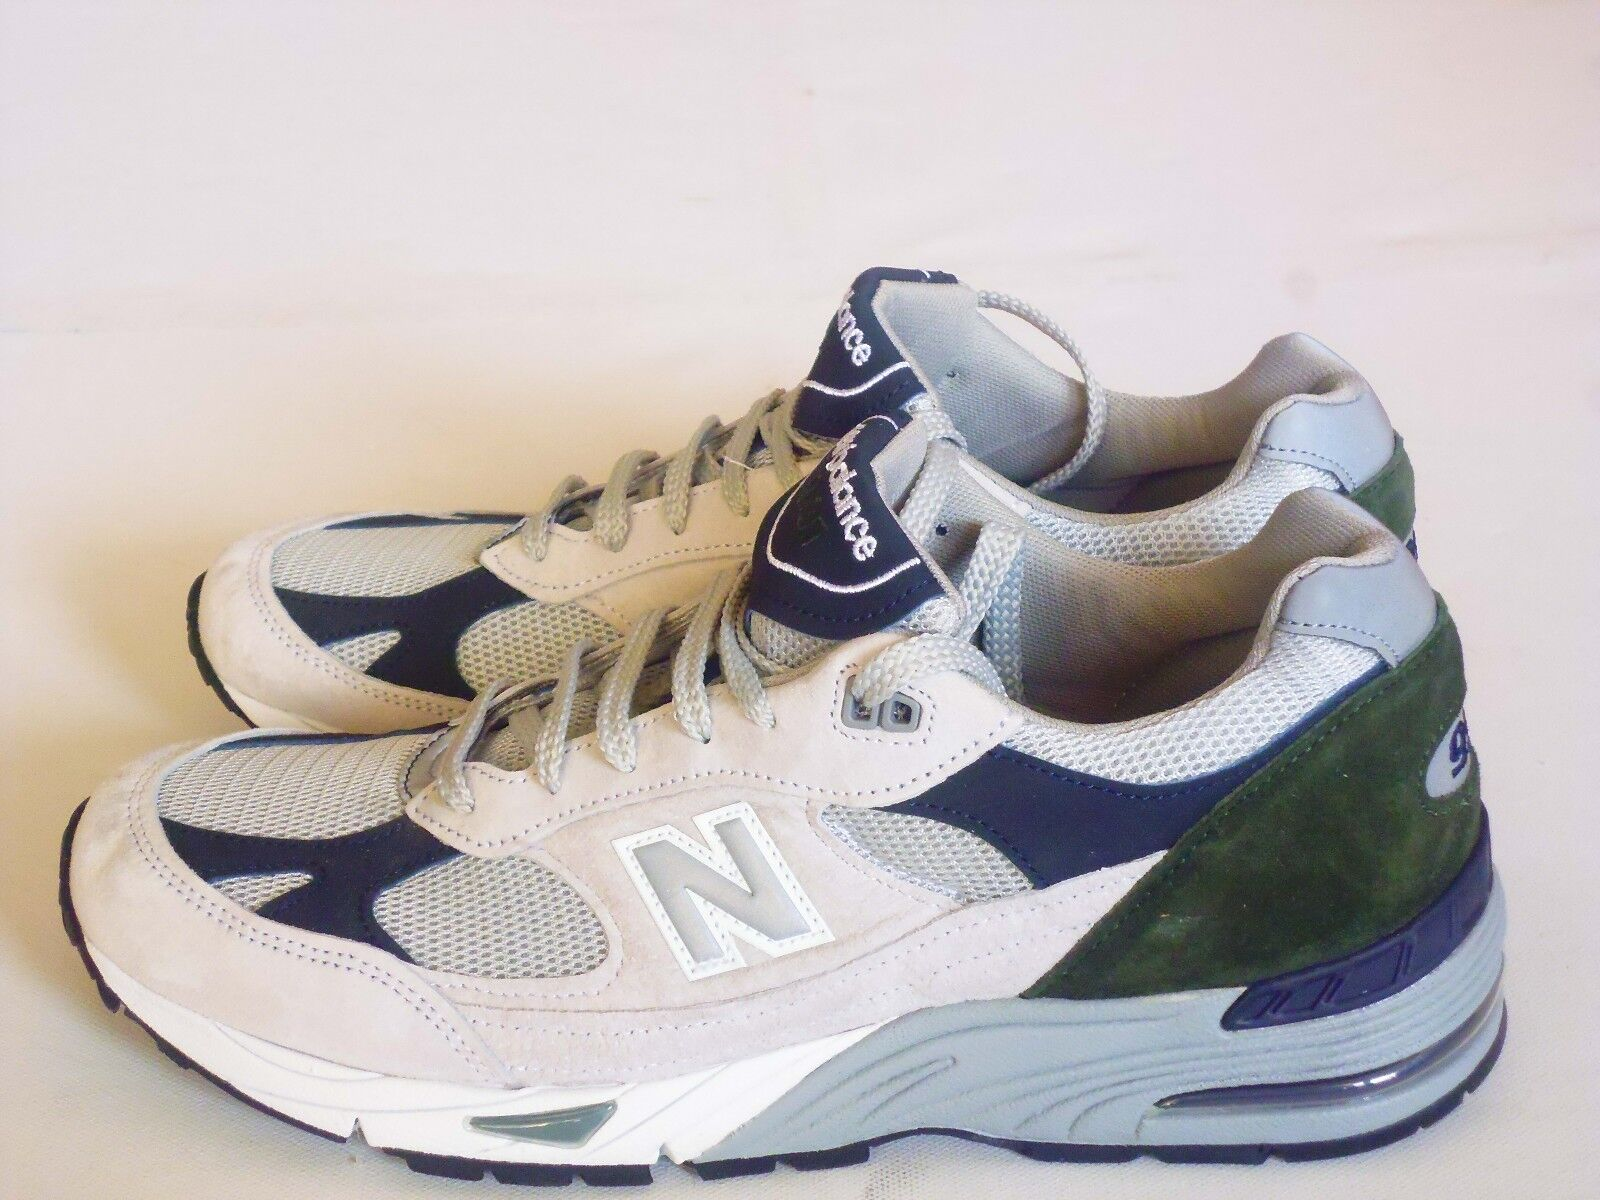 NEU Balance Herren Sneakers ,NEU Balance  M991 WGN Herren Sneakers Gr; EUR 45.5